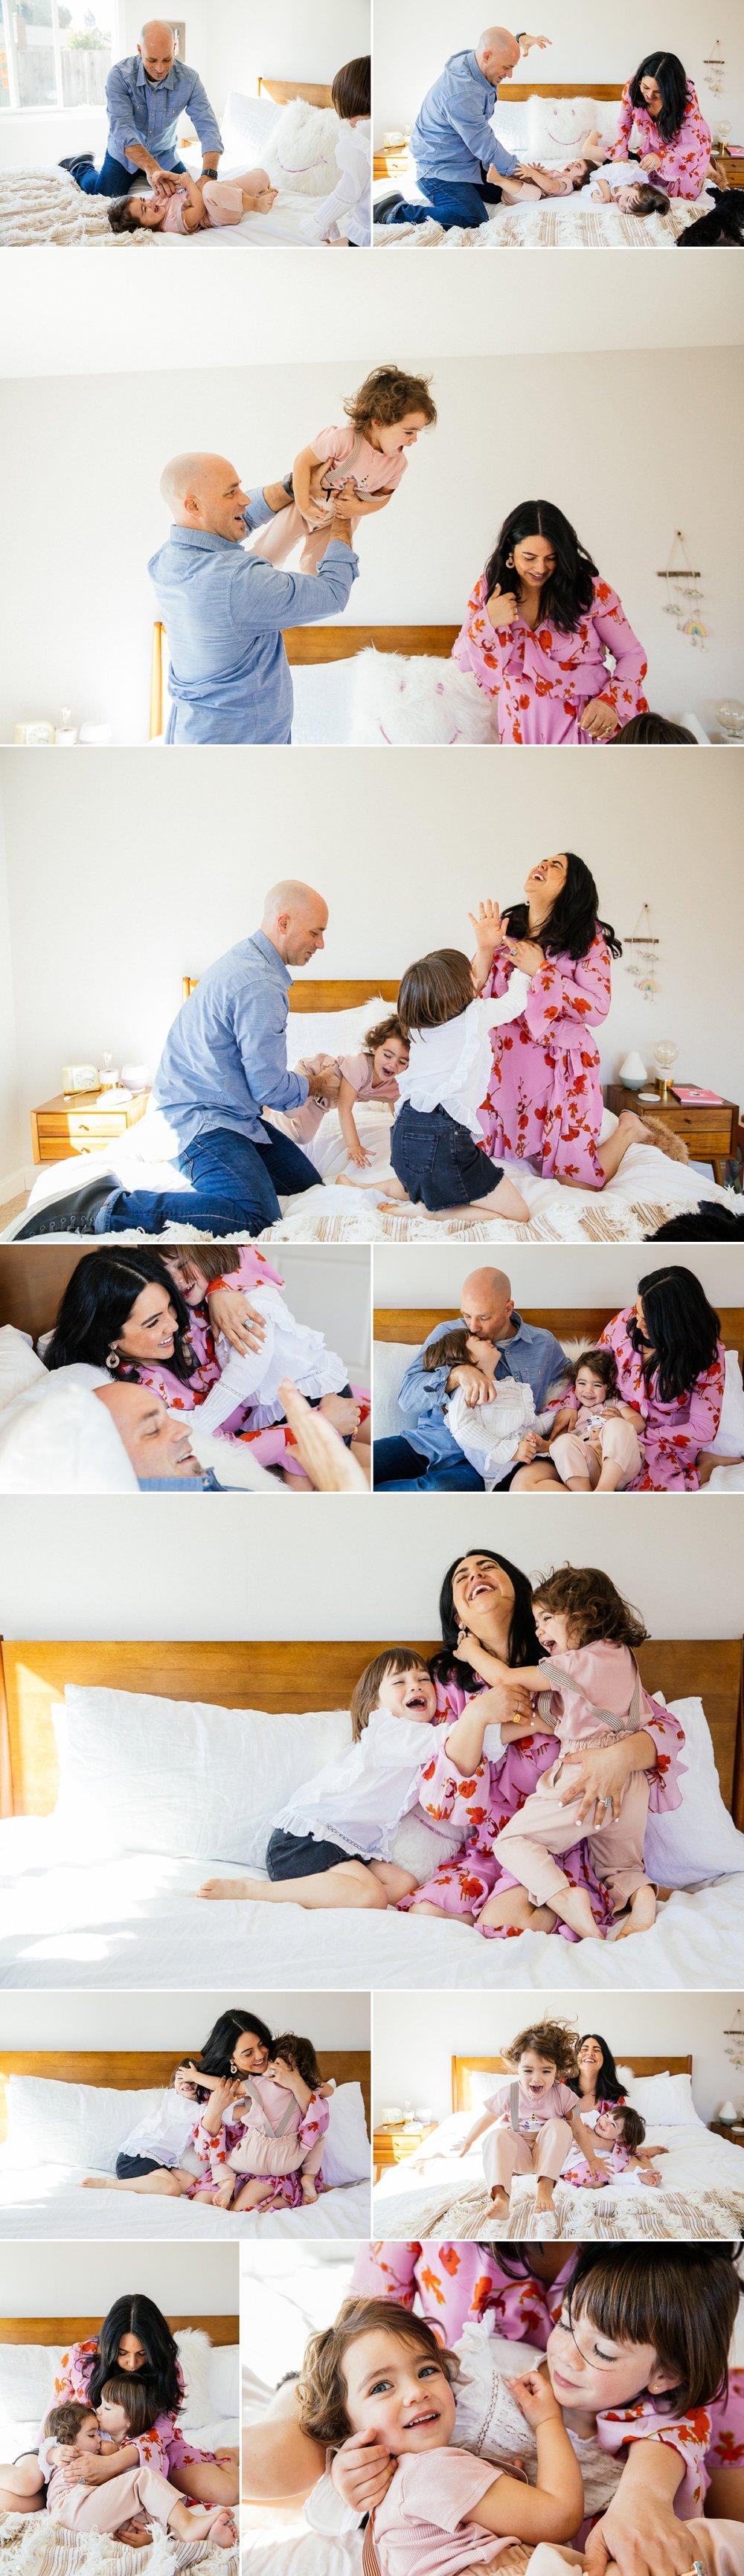 family photo session karla quiz.jpg